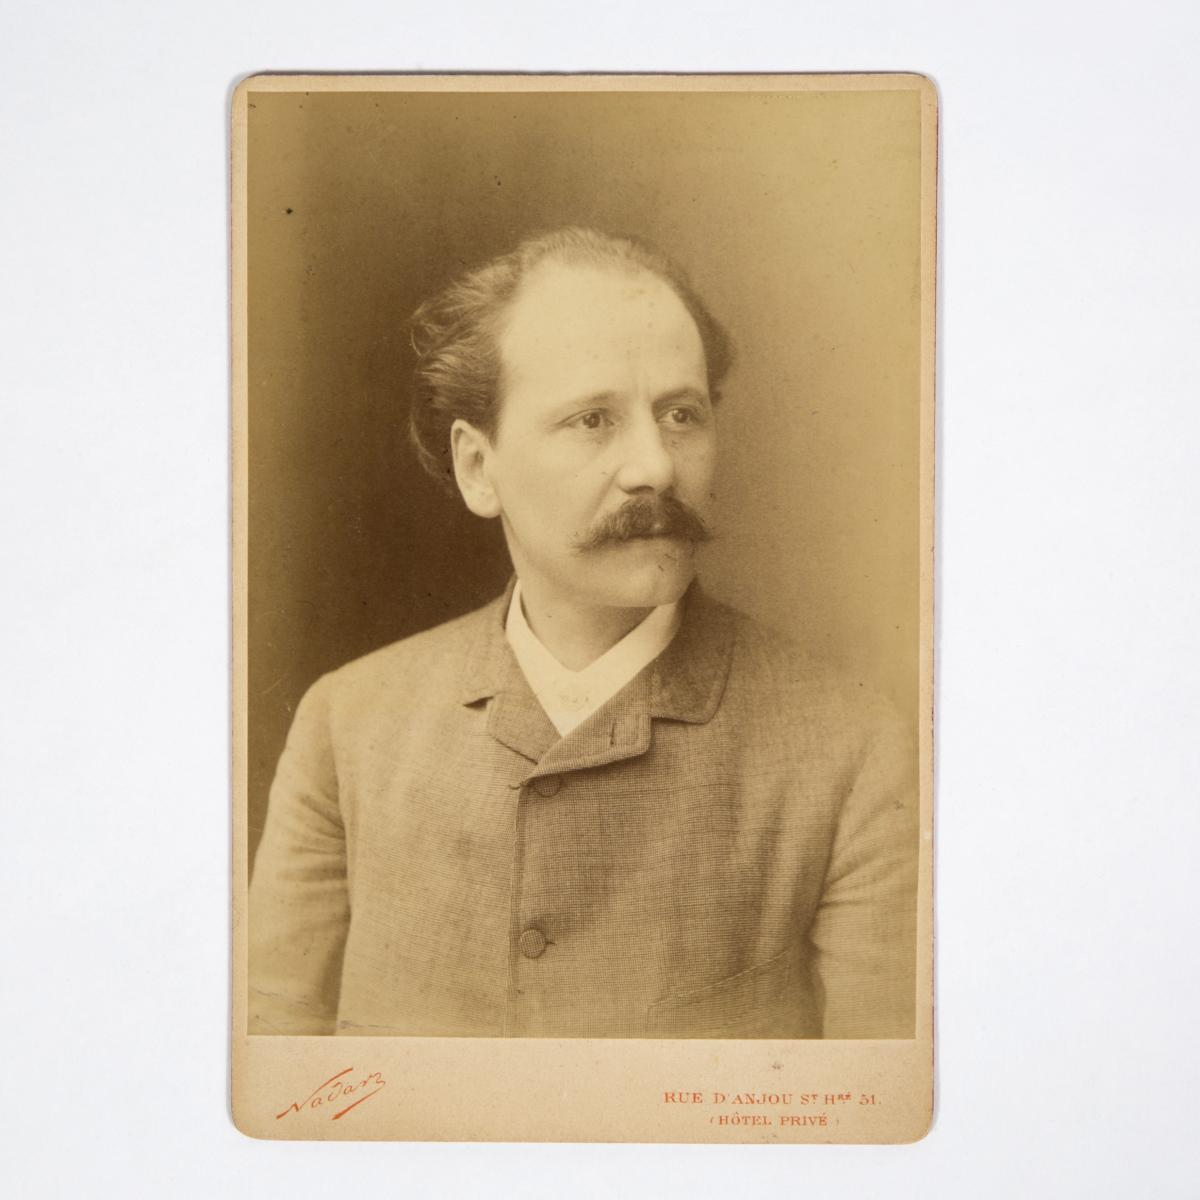 Nadar (1820-1910), Portait de Jules Massenet